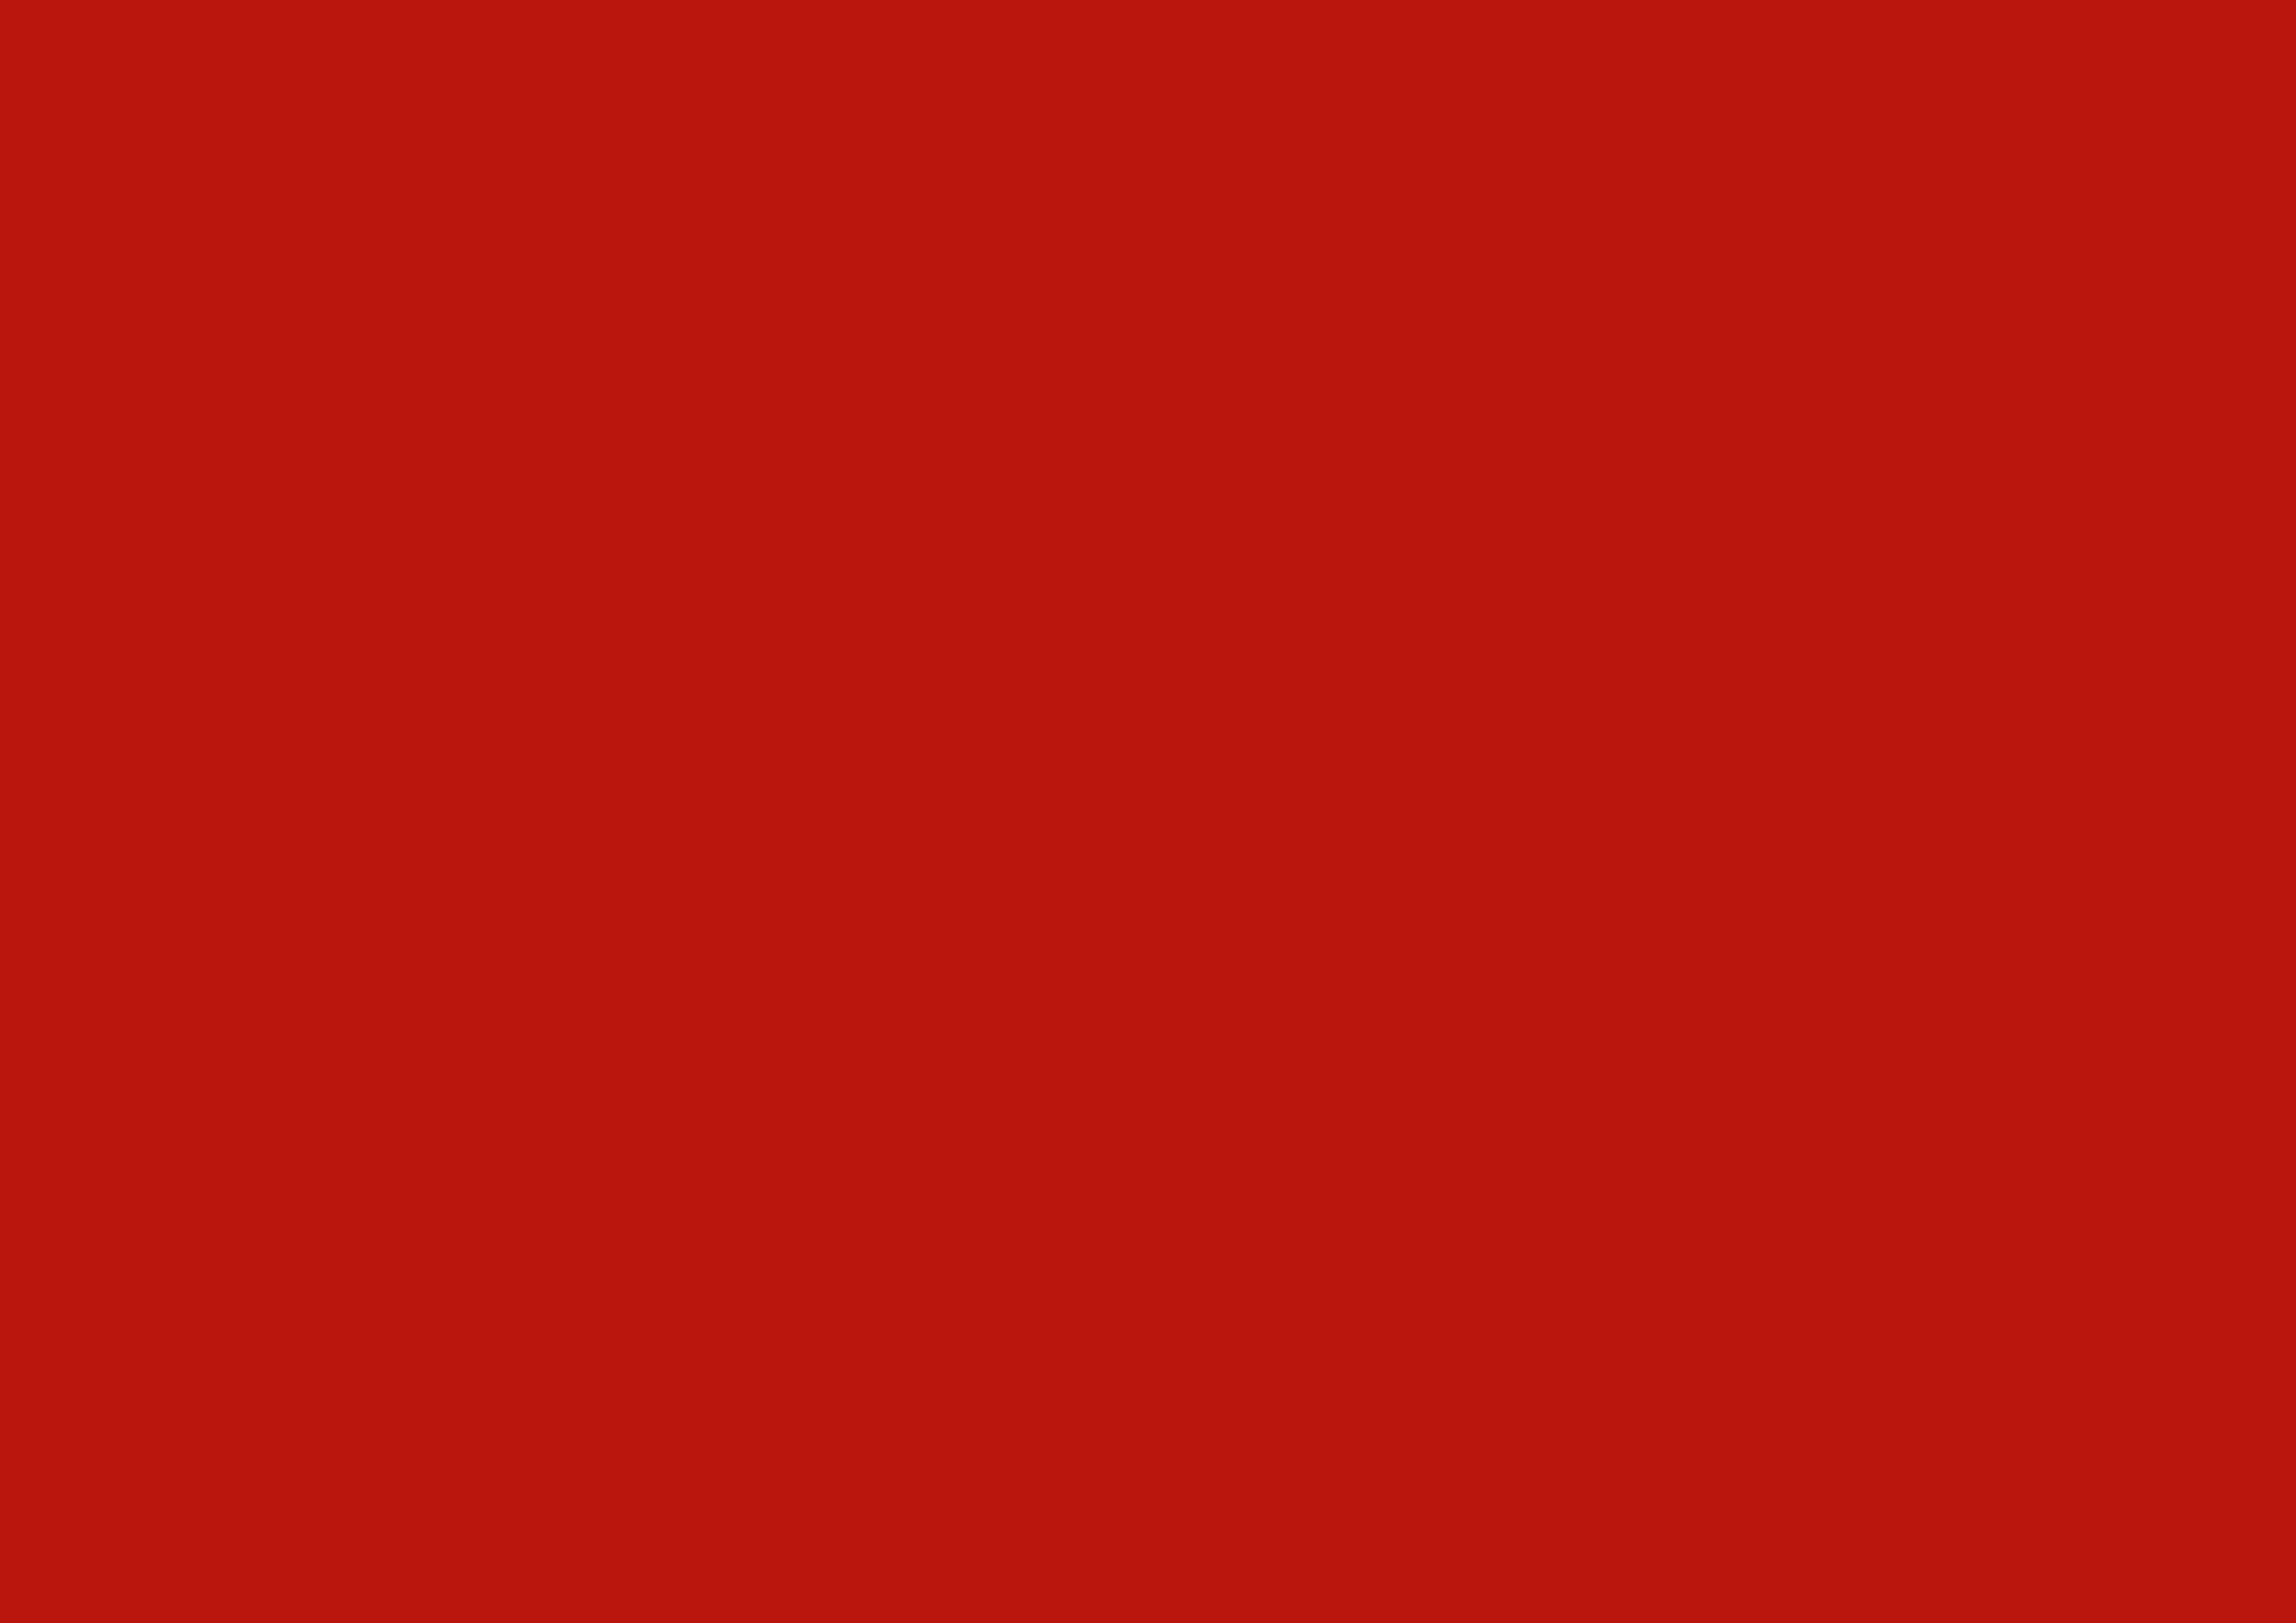 3508x2480 International Orange Engineering Solid Color Background